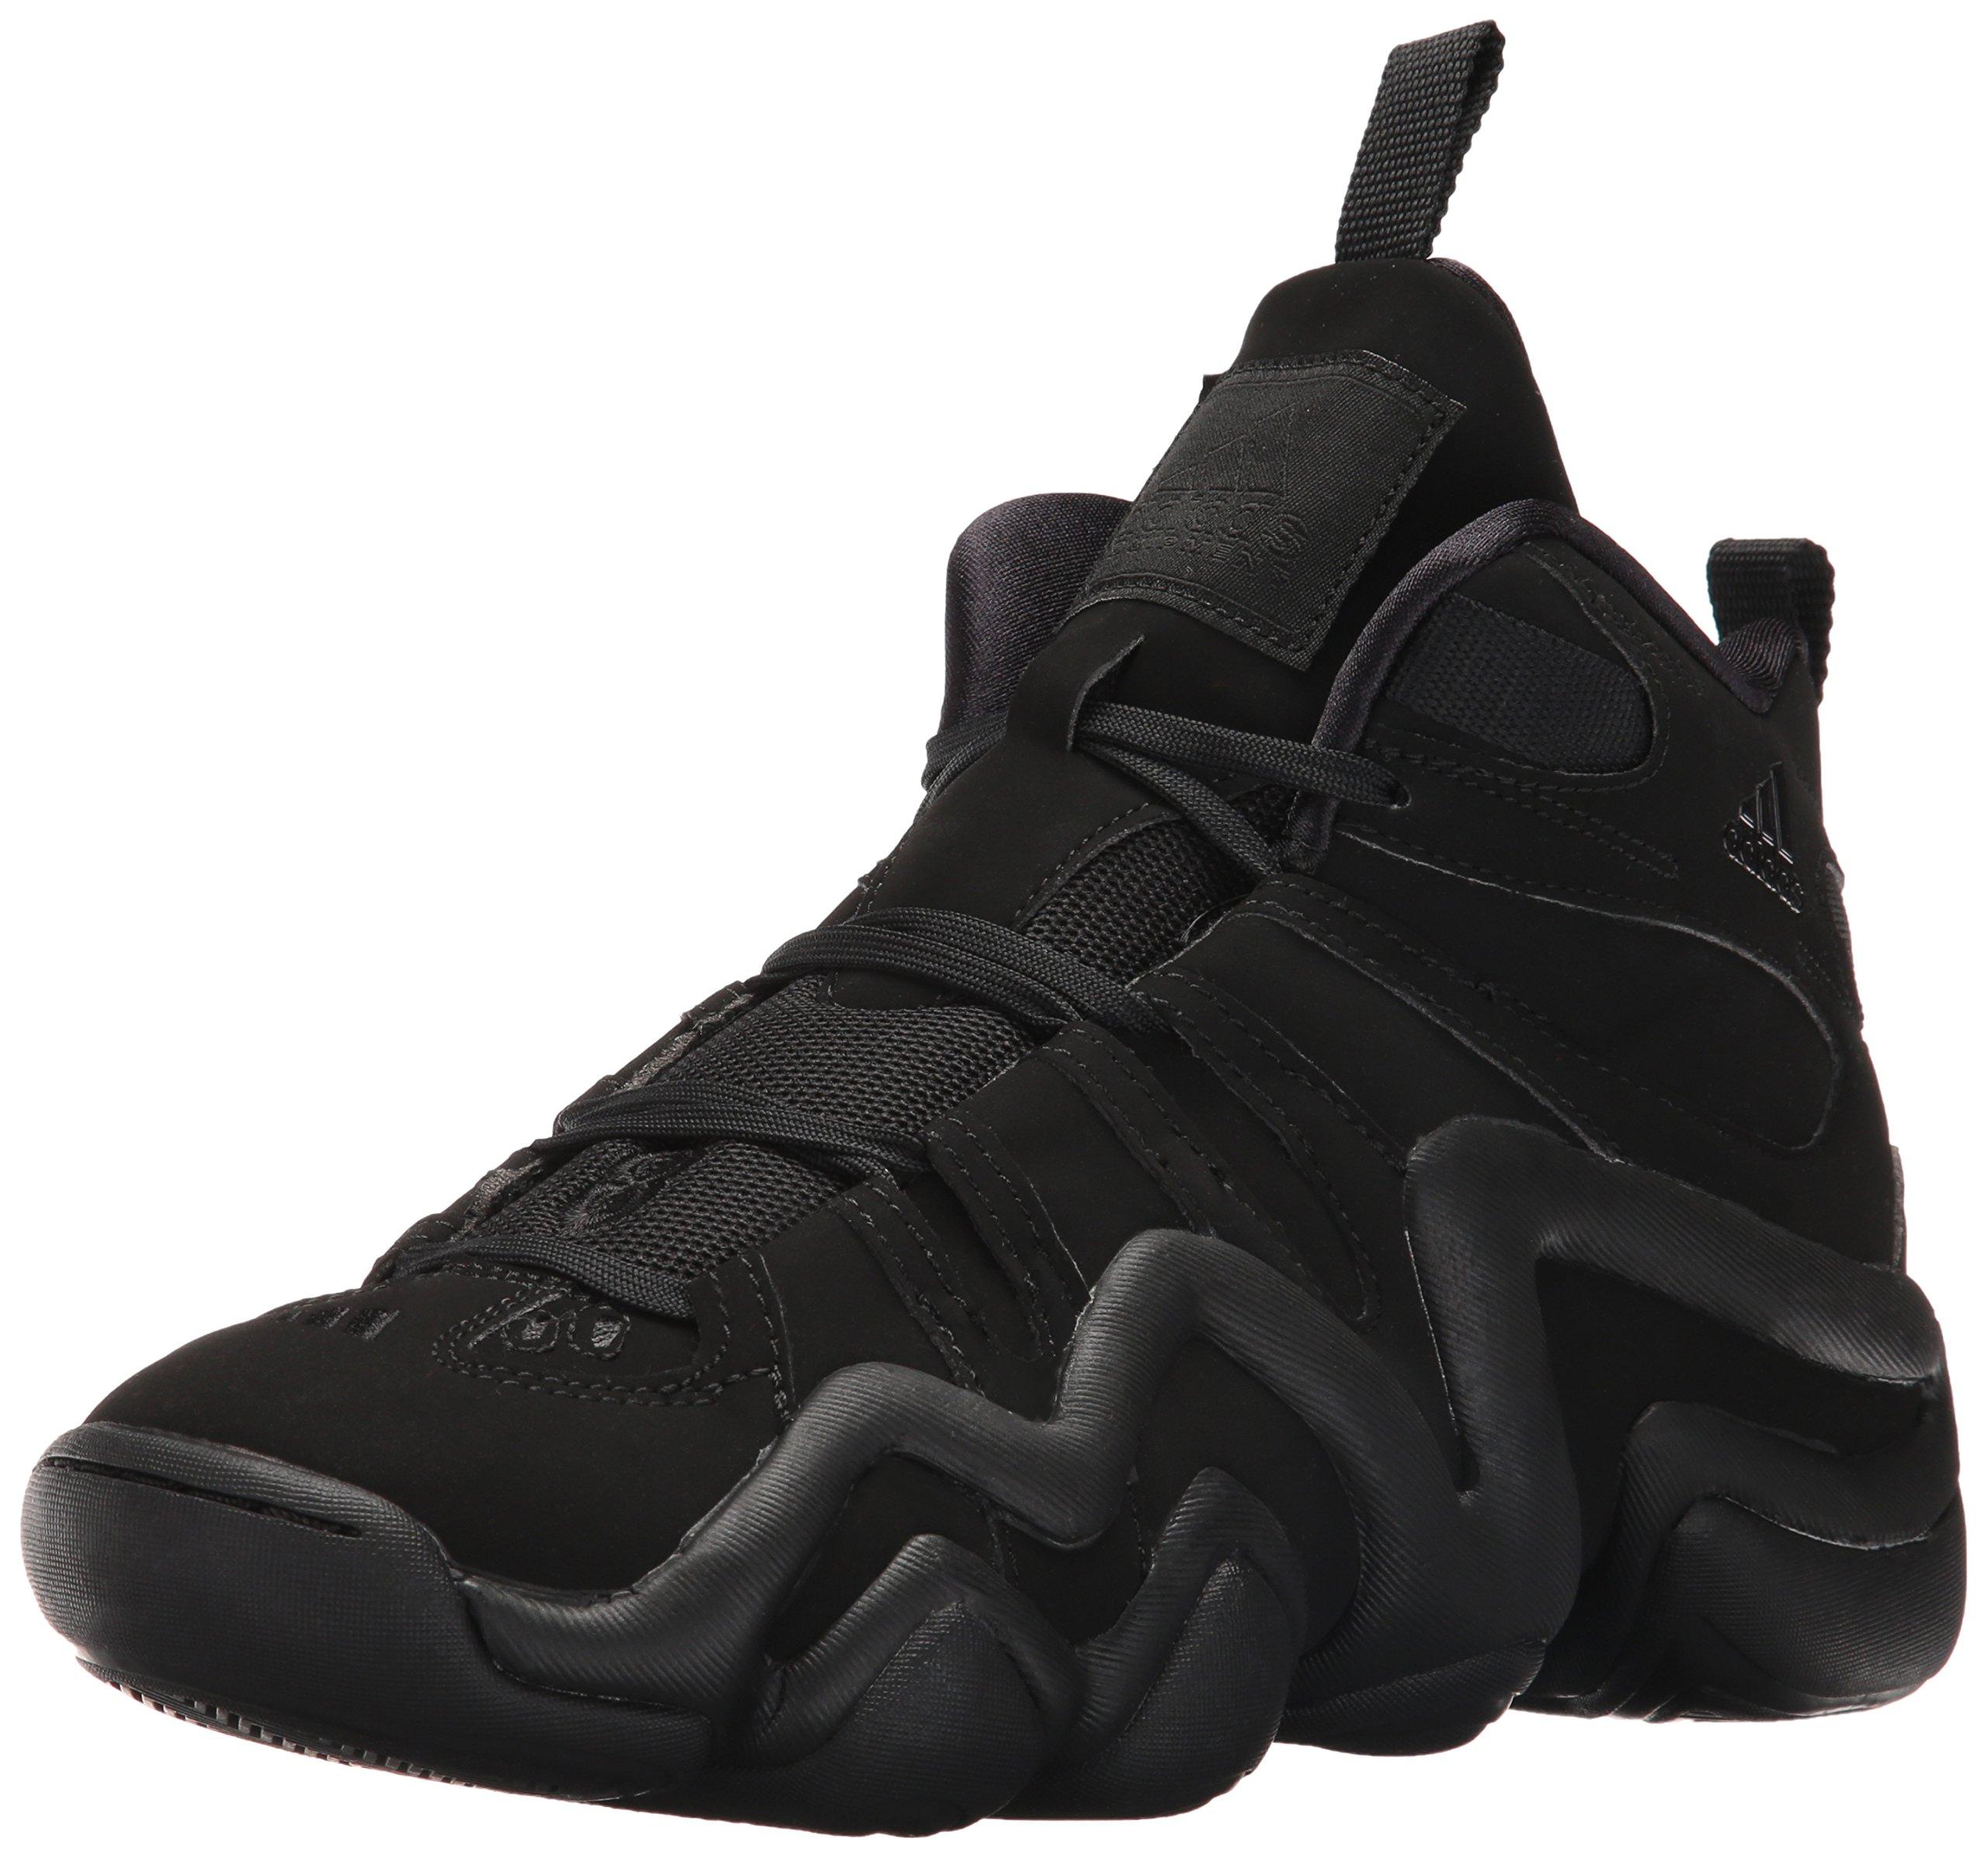 32f96abbf5f Galleon - Adidas Men s Crazy 8 Basketball Shoe